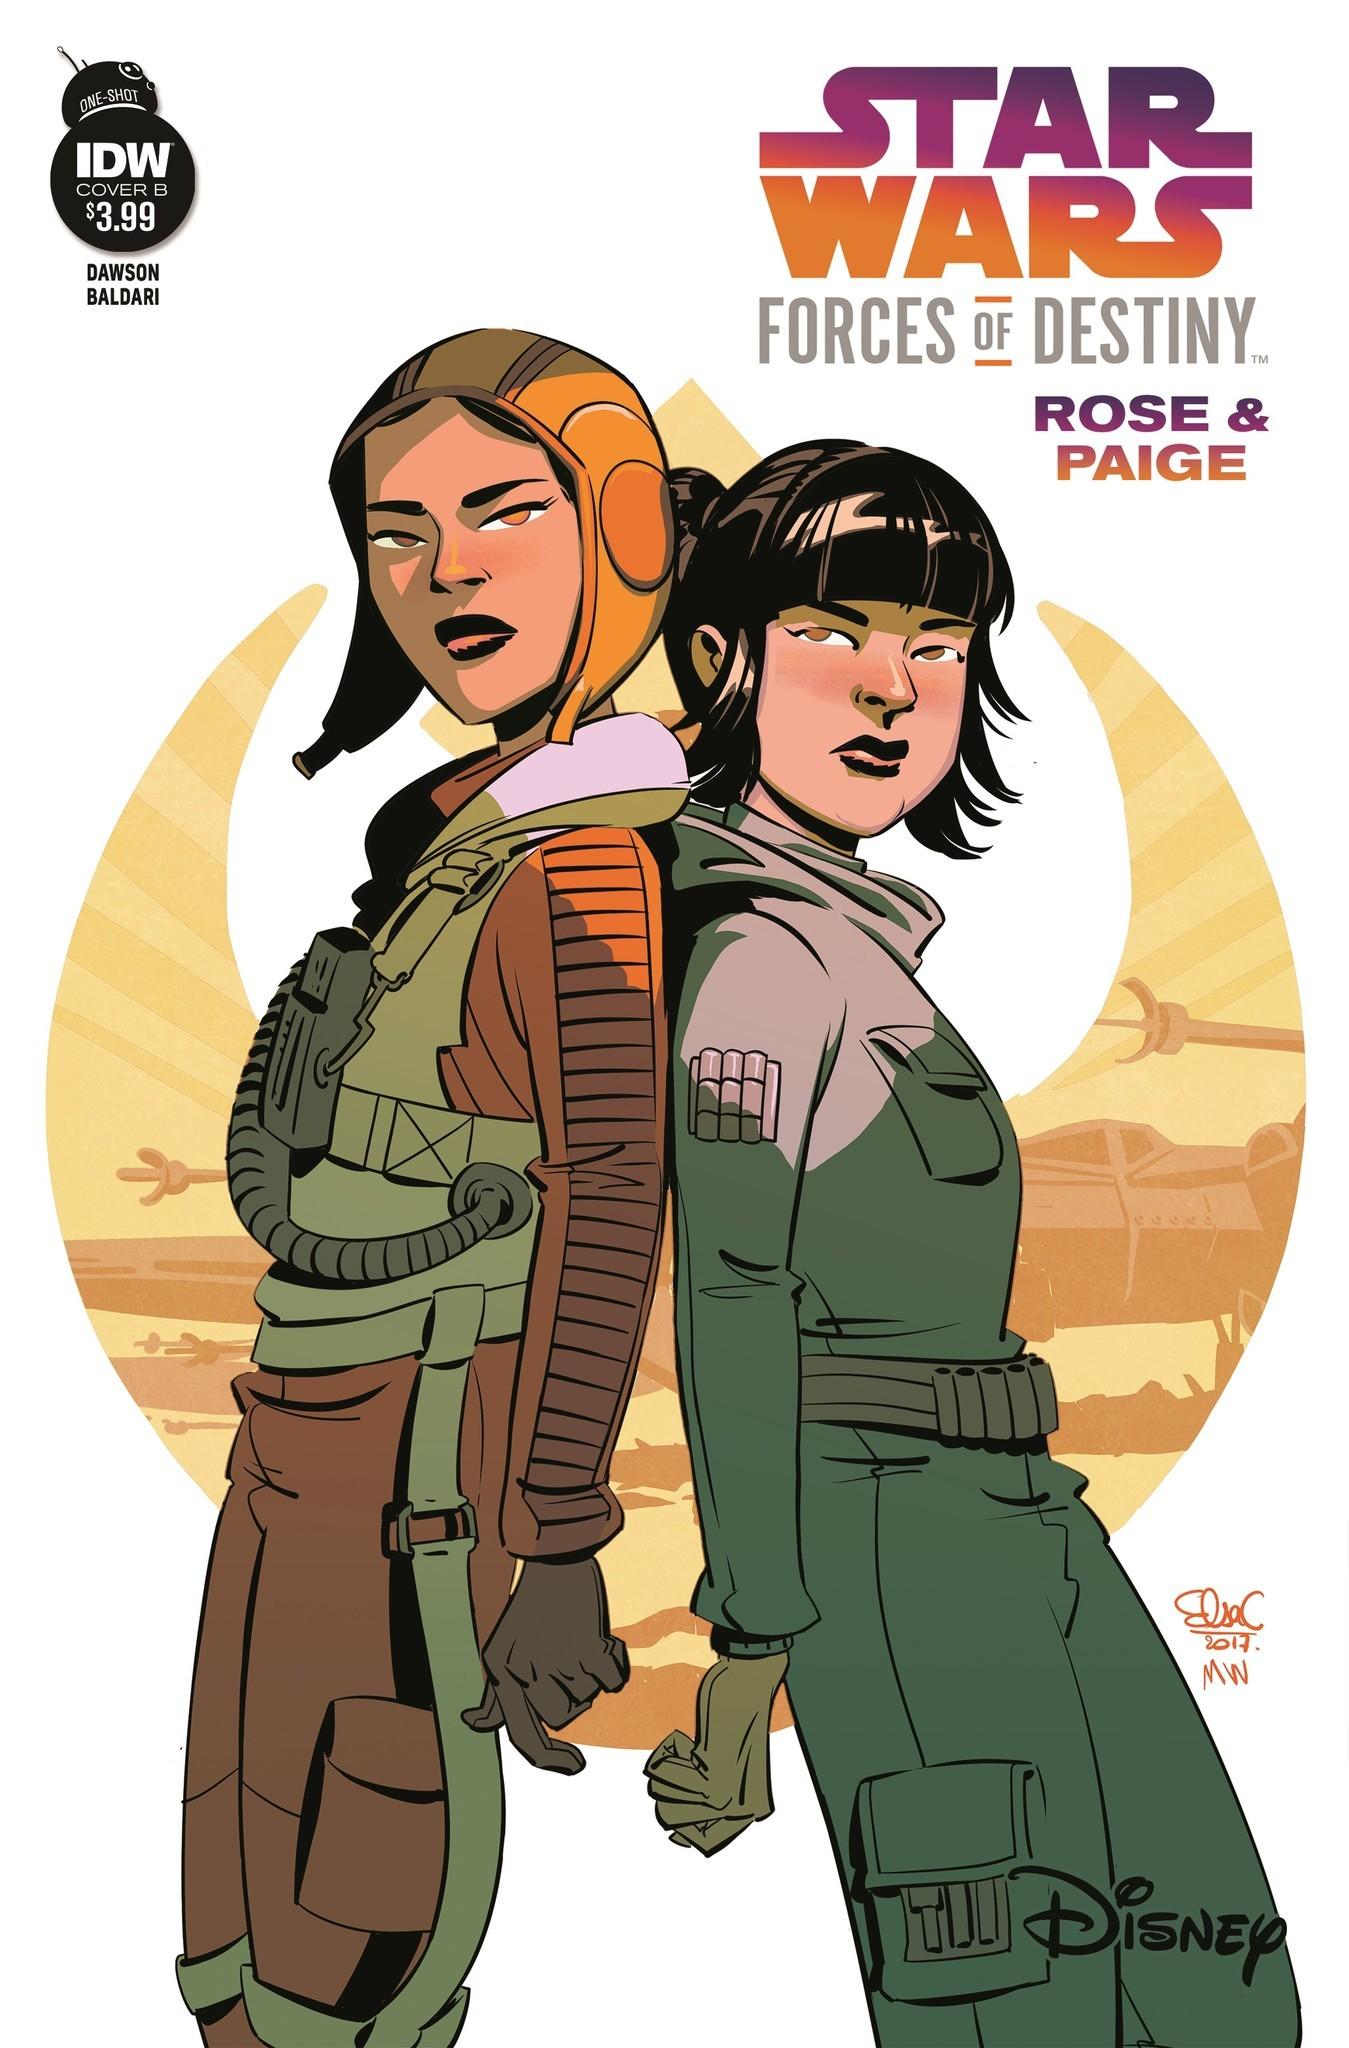 Forces of Destiny - Rose & Paige (Cover B by Elsa Charretier) (31.01.2018)